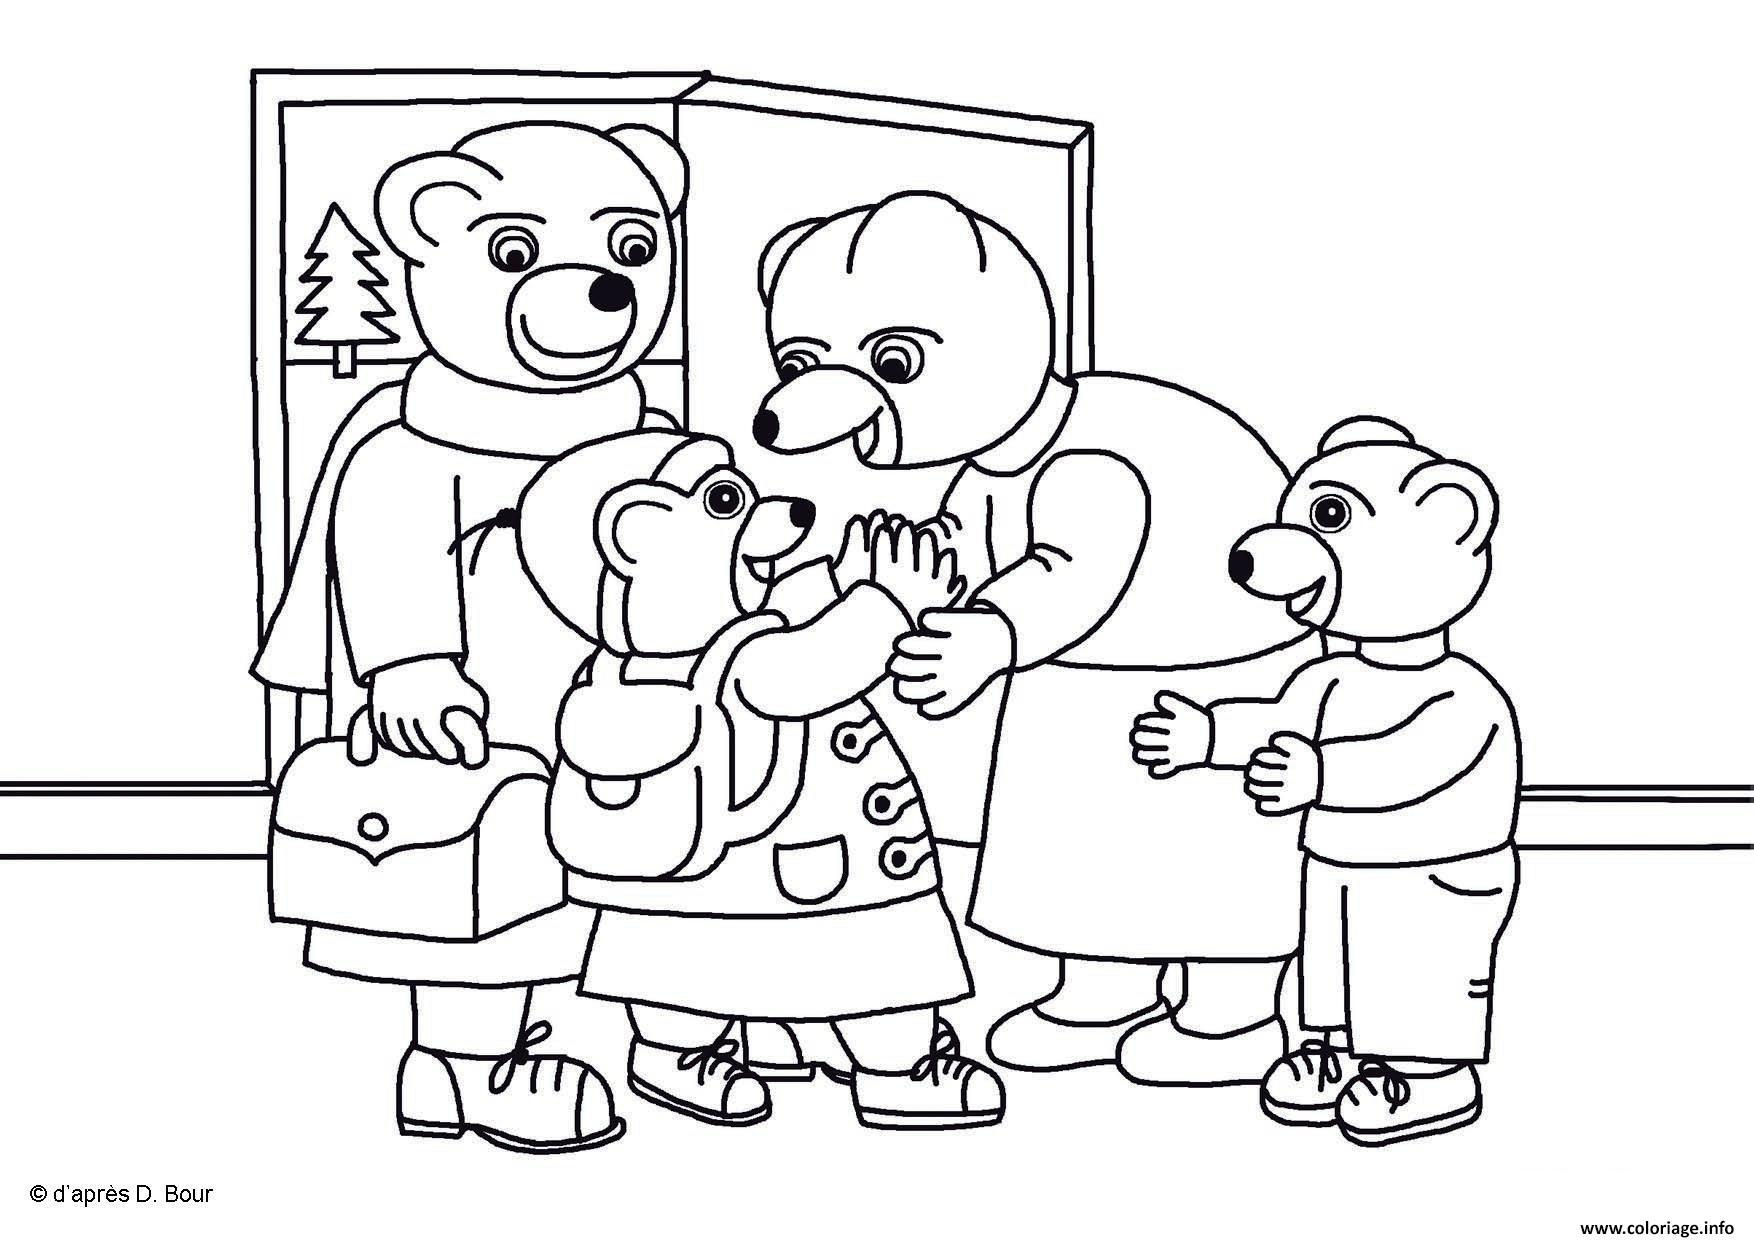 Coloriage Famille Ours.Coloriage Petit Ours Brun Passe Lhiver En Famille Page 001